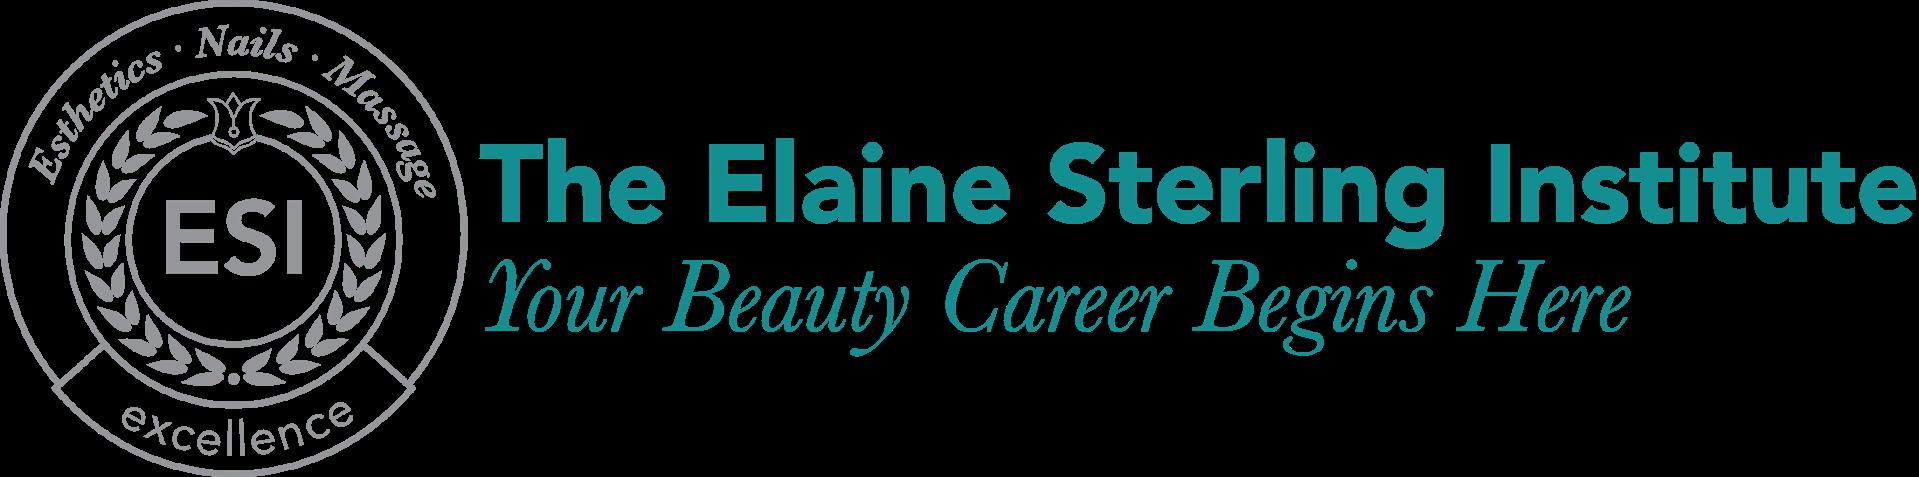 The Elaine Sterling Institute